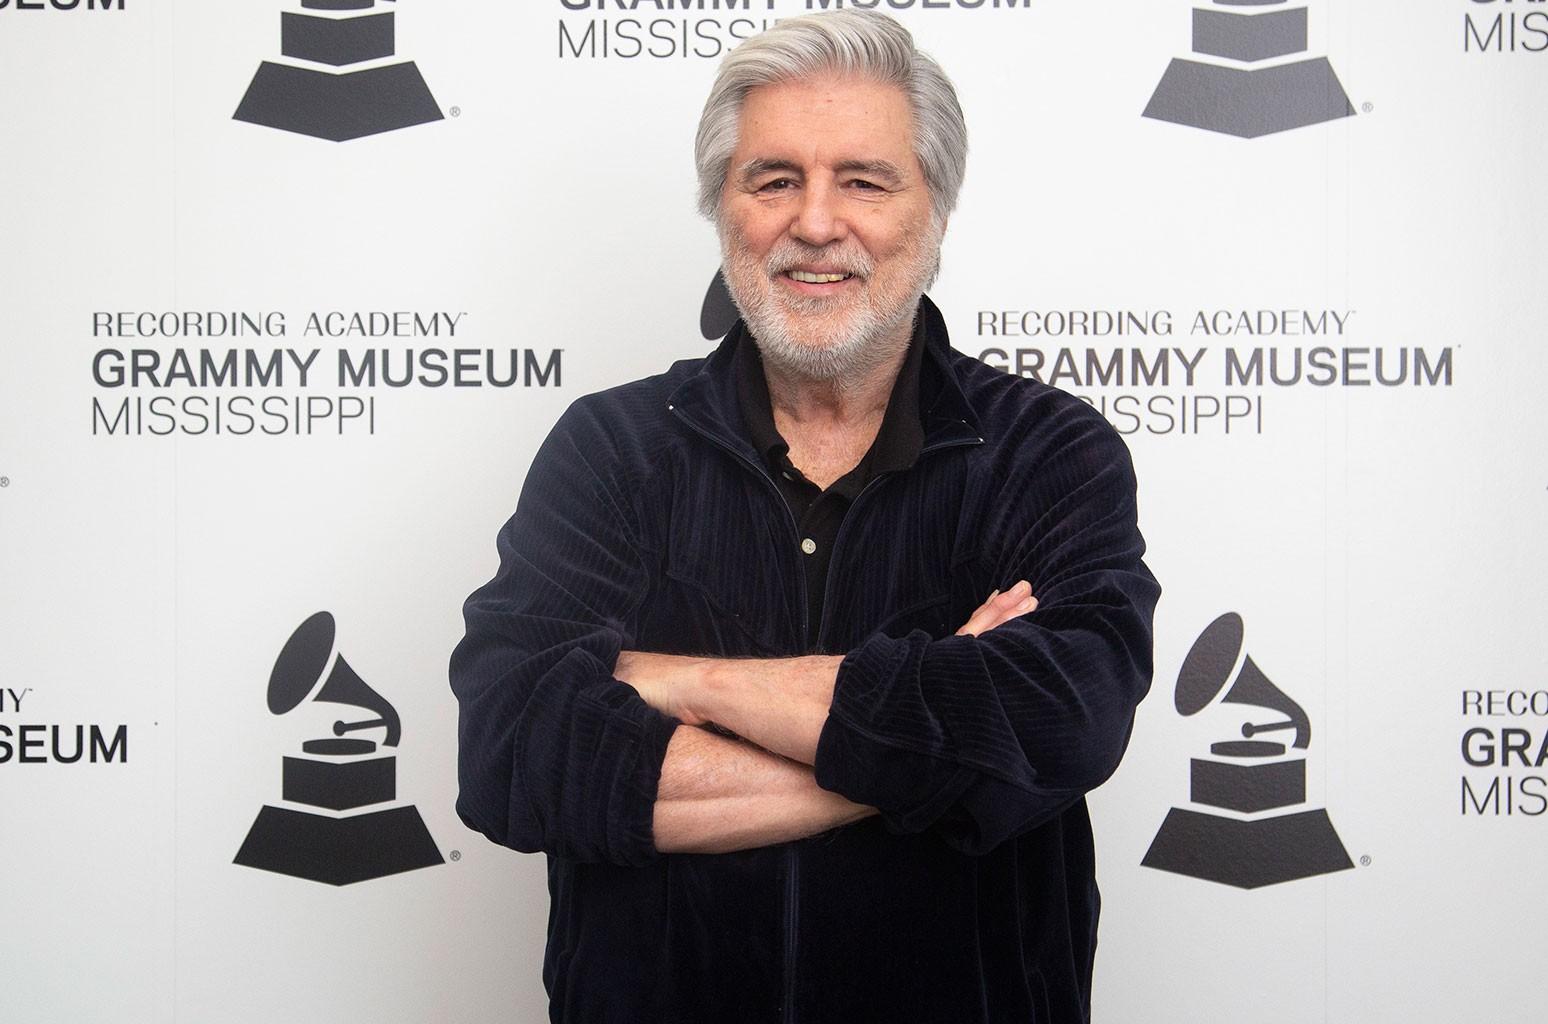 Jim Weatherly, 'Midnight Train to Georgia' Songwriter, Dies at 77